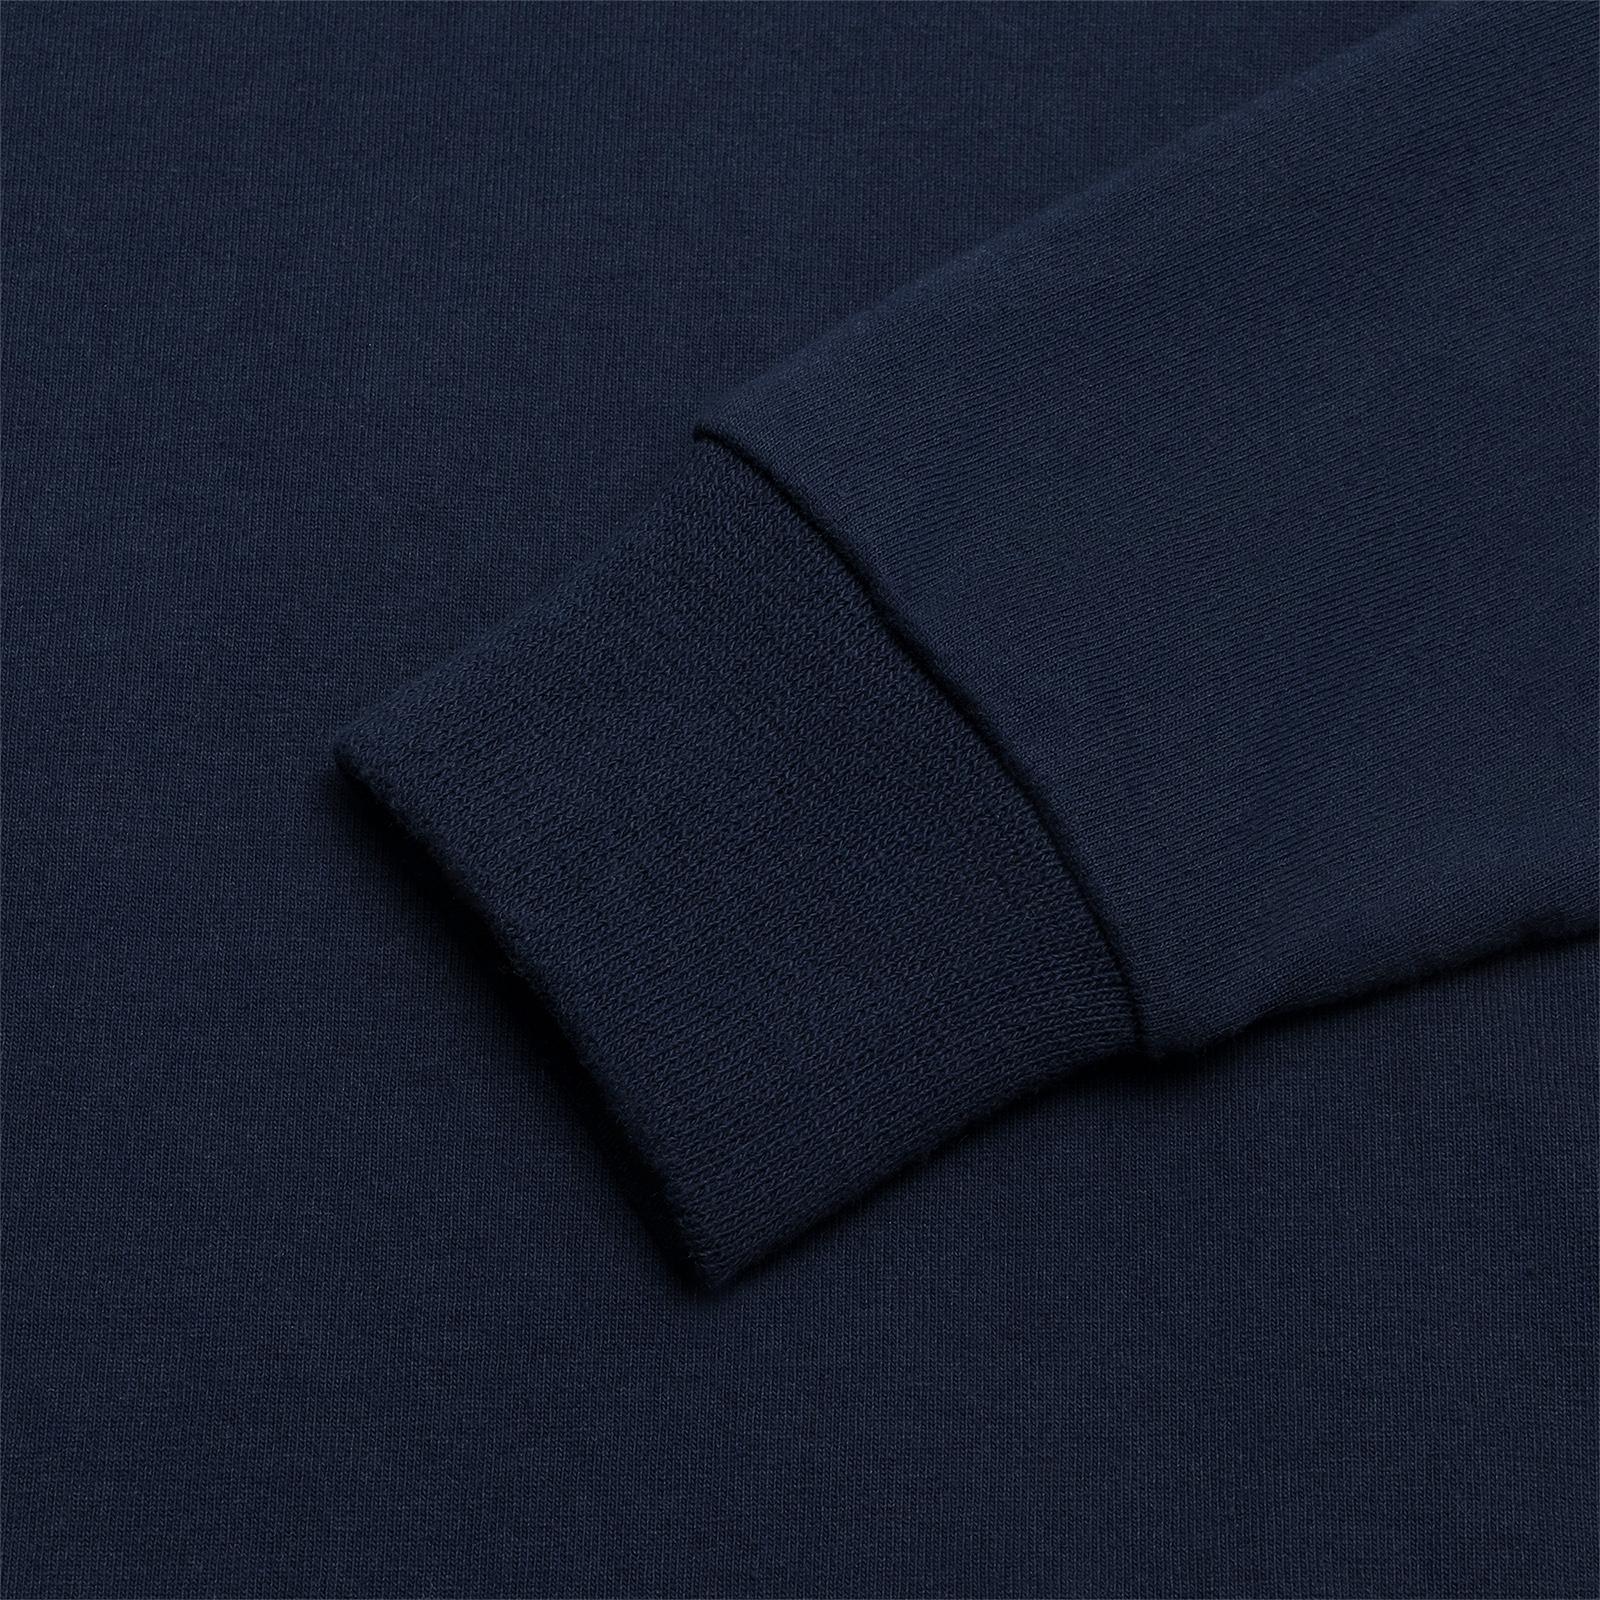 Sleeve close up product photo